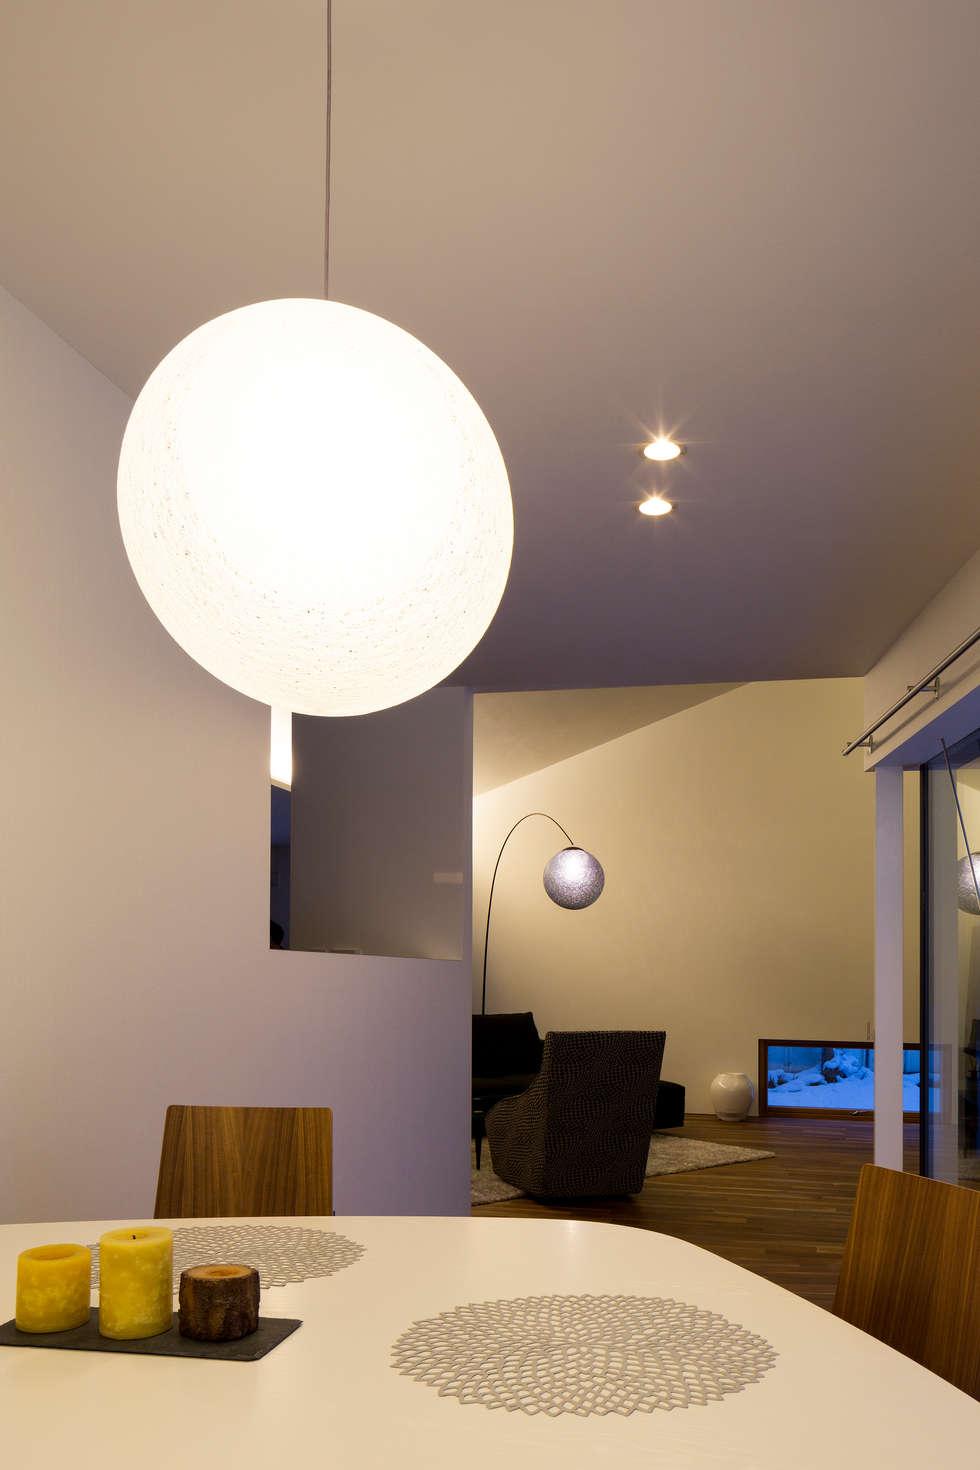 YMT residence 06: 浅香建築設計事務所 asaka architectural designが手掛けたダイニングです。